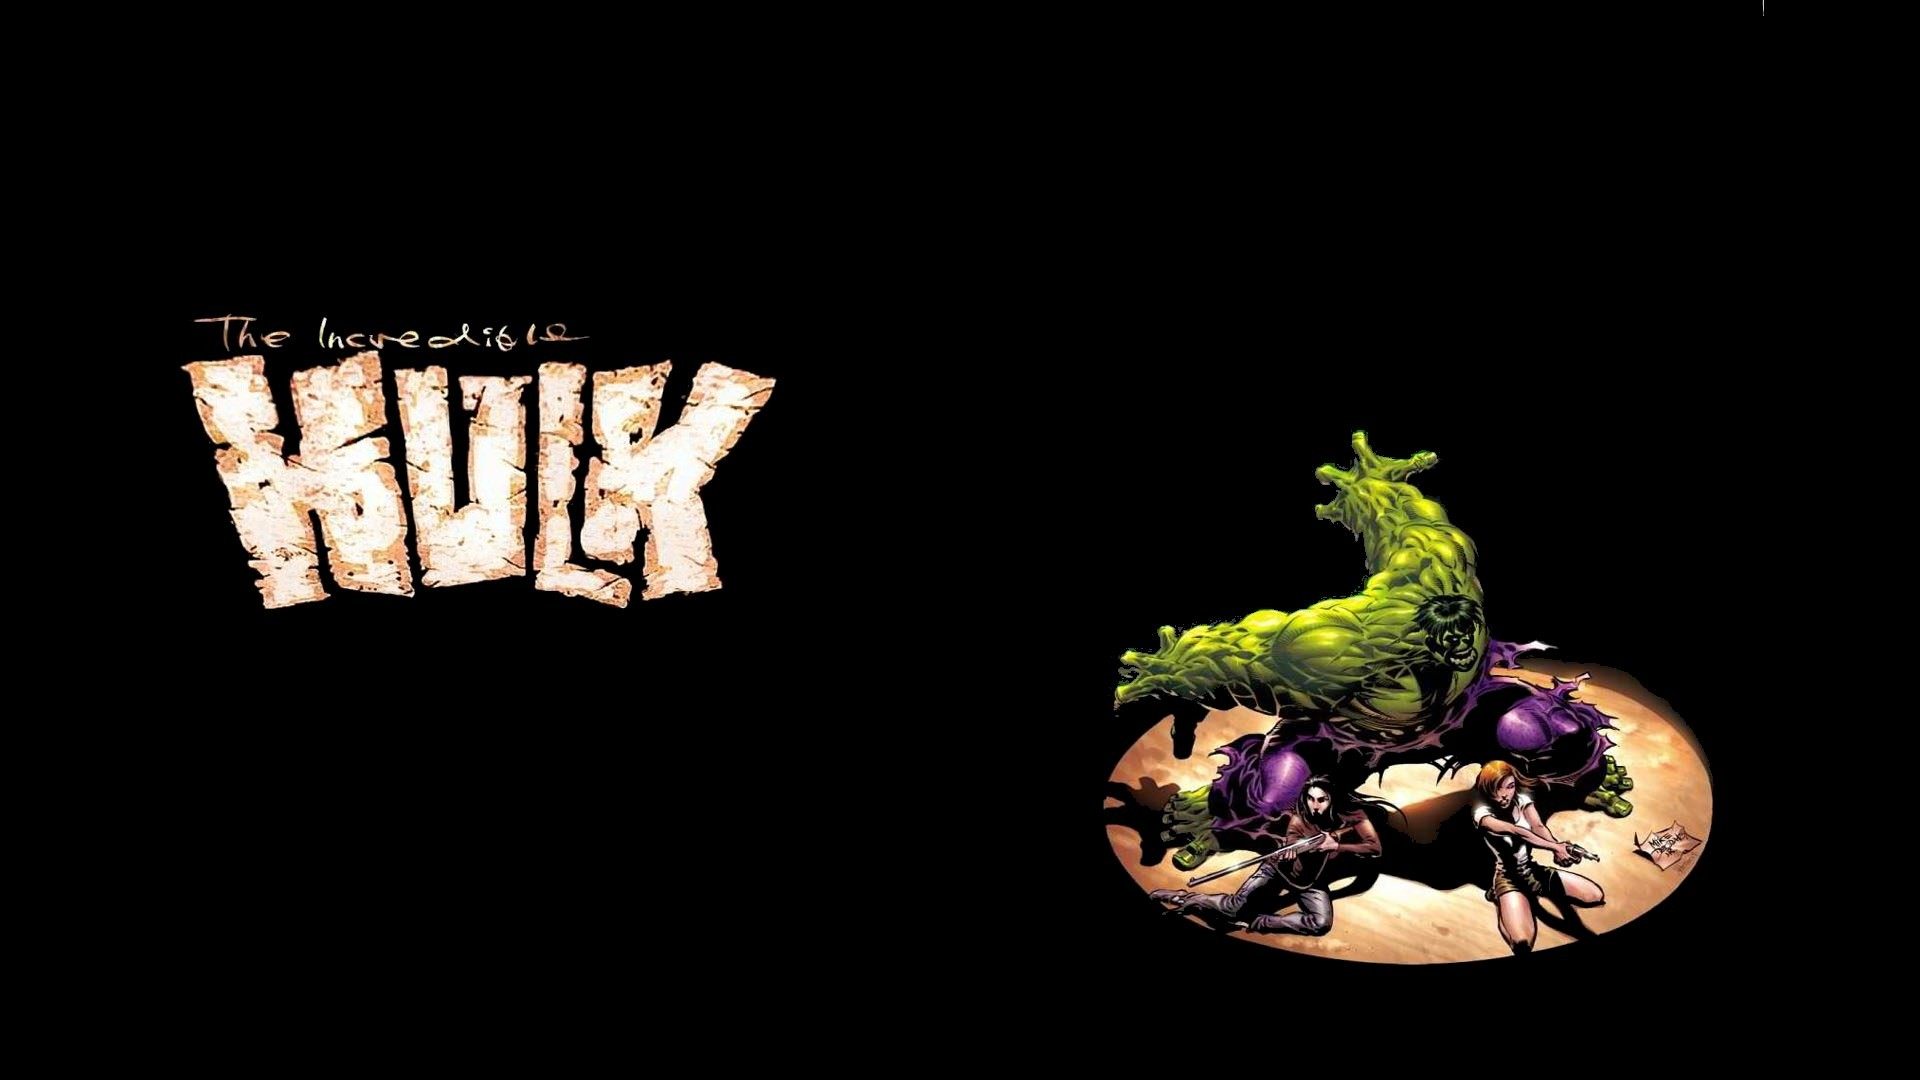 hulk hd wallpapers 1080p windows. windows wallpaper the  incredible hulk